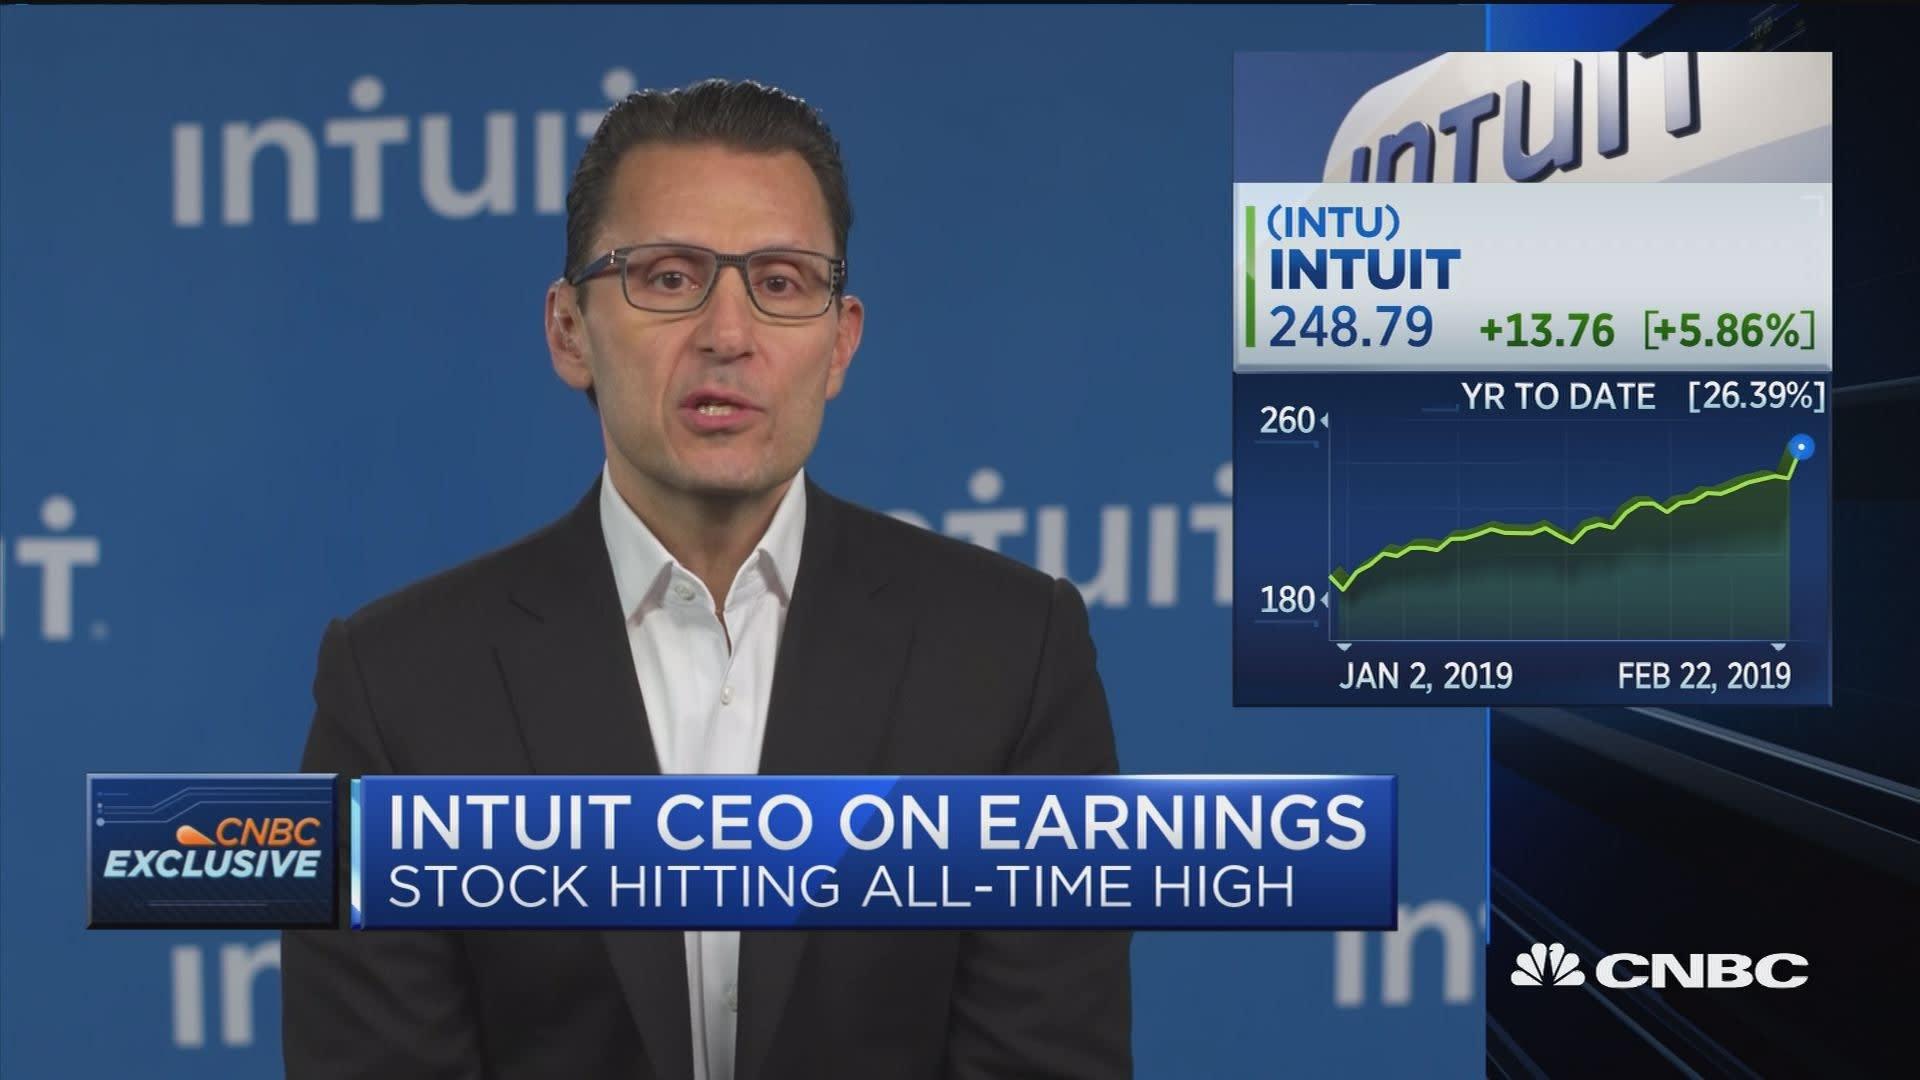 CNBC spokesman on Intuit stock